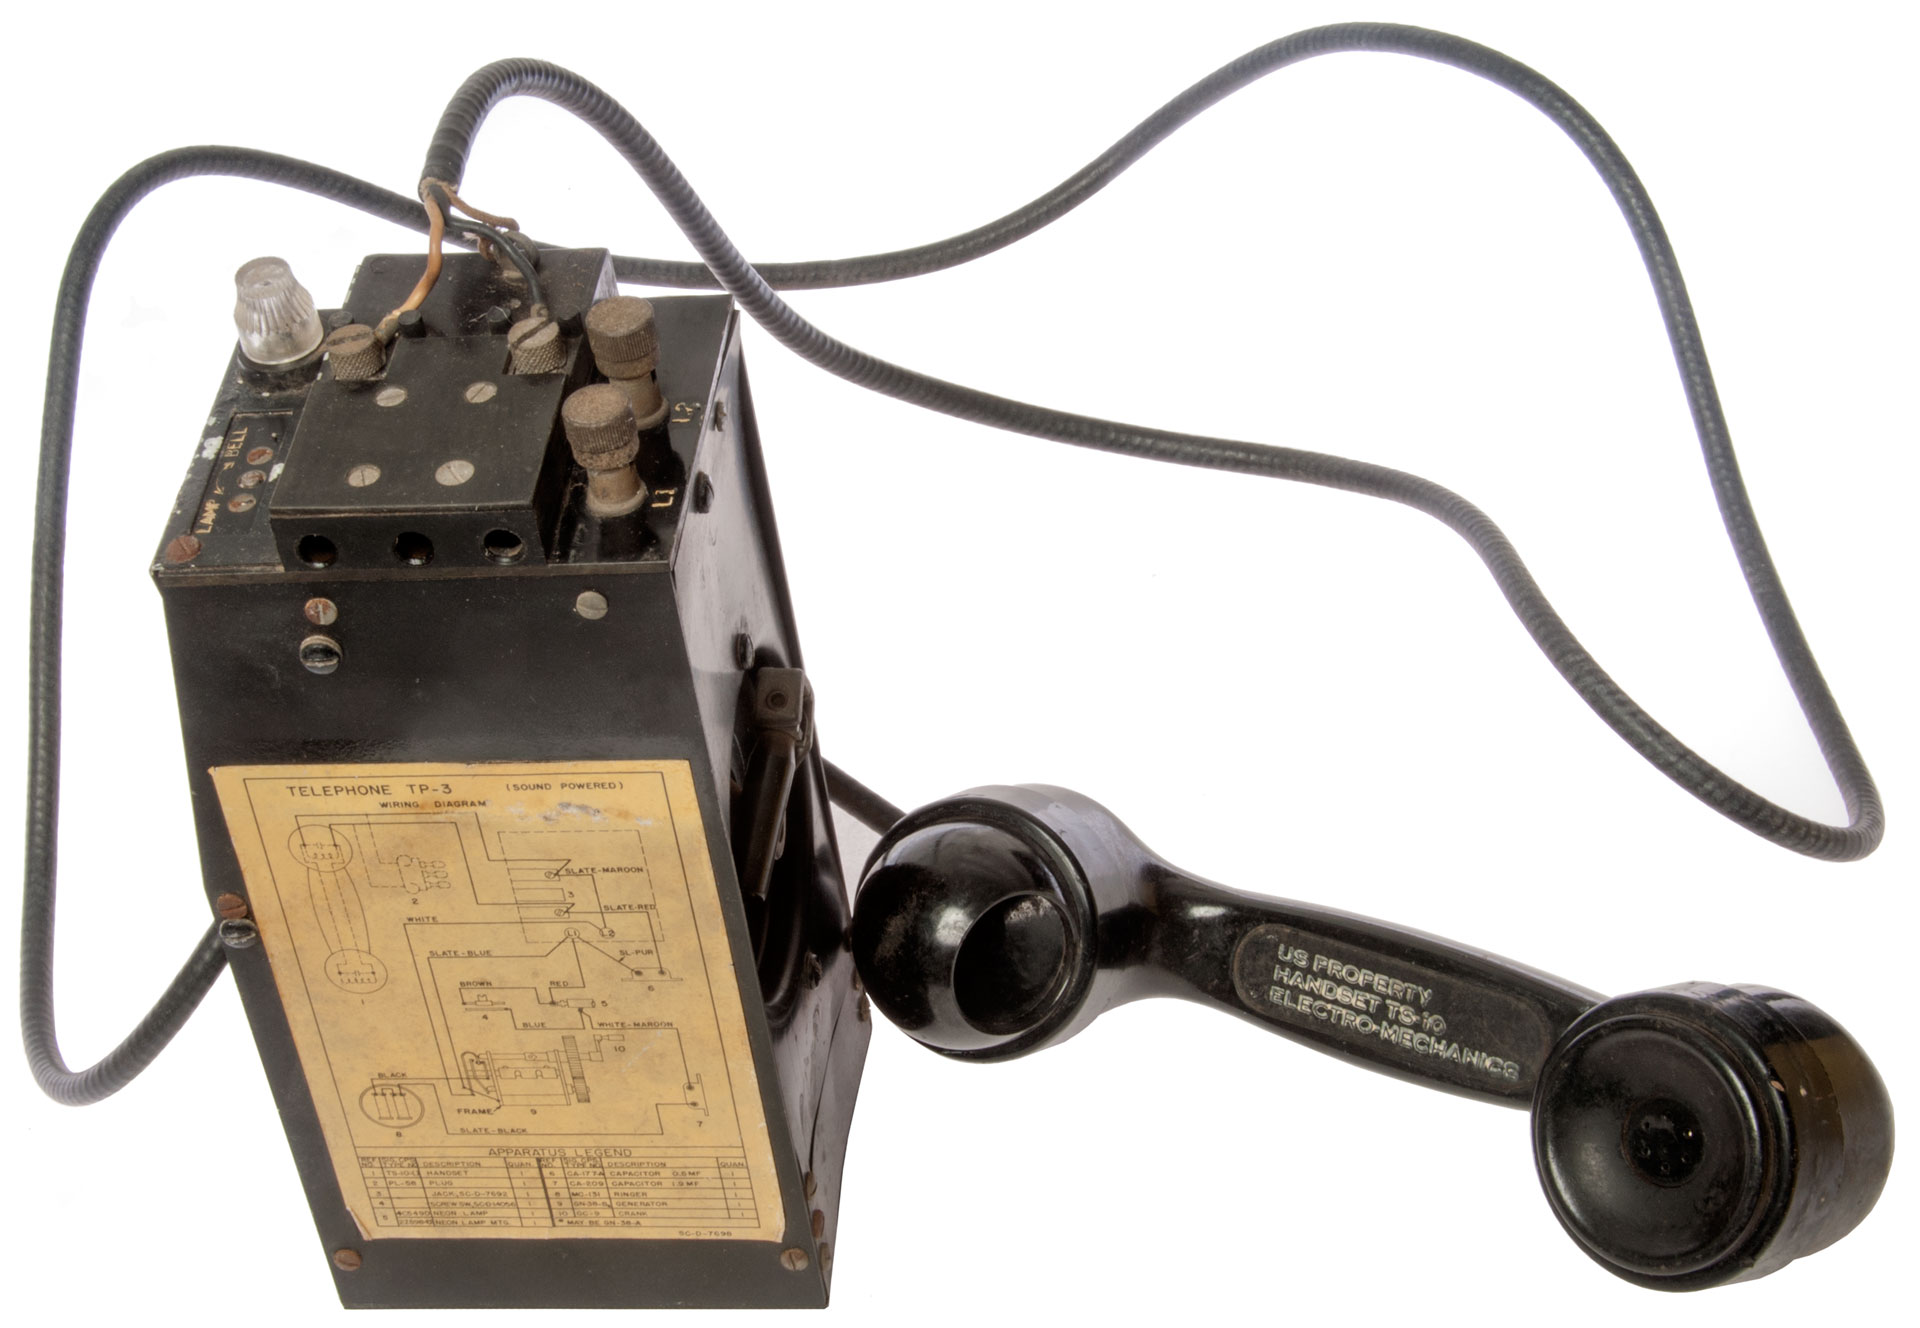 tp-3 sound powered telephone set